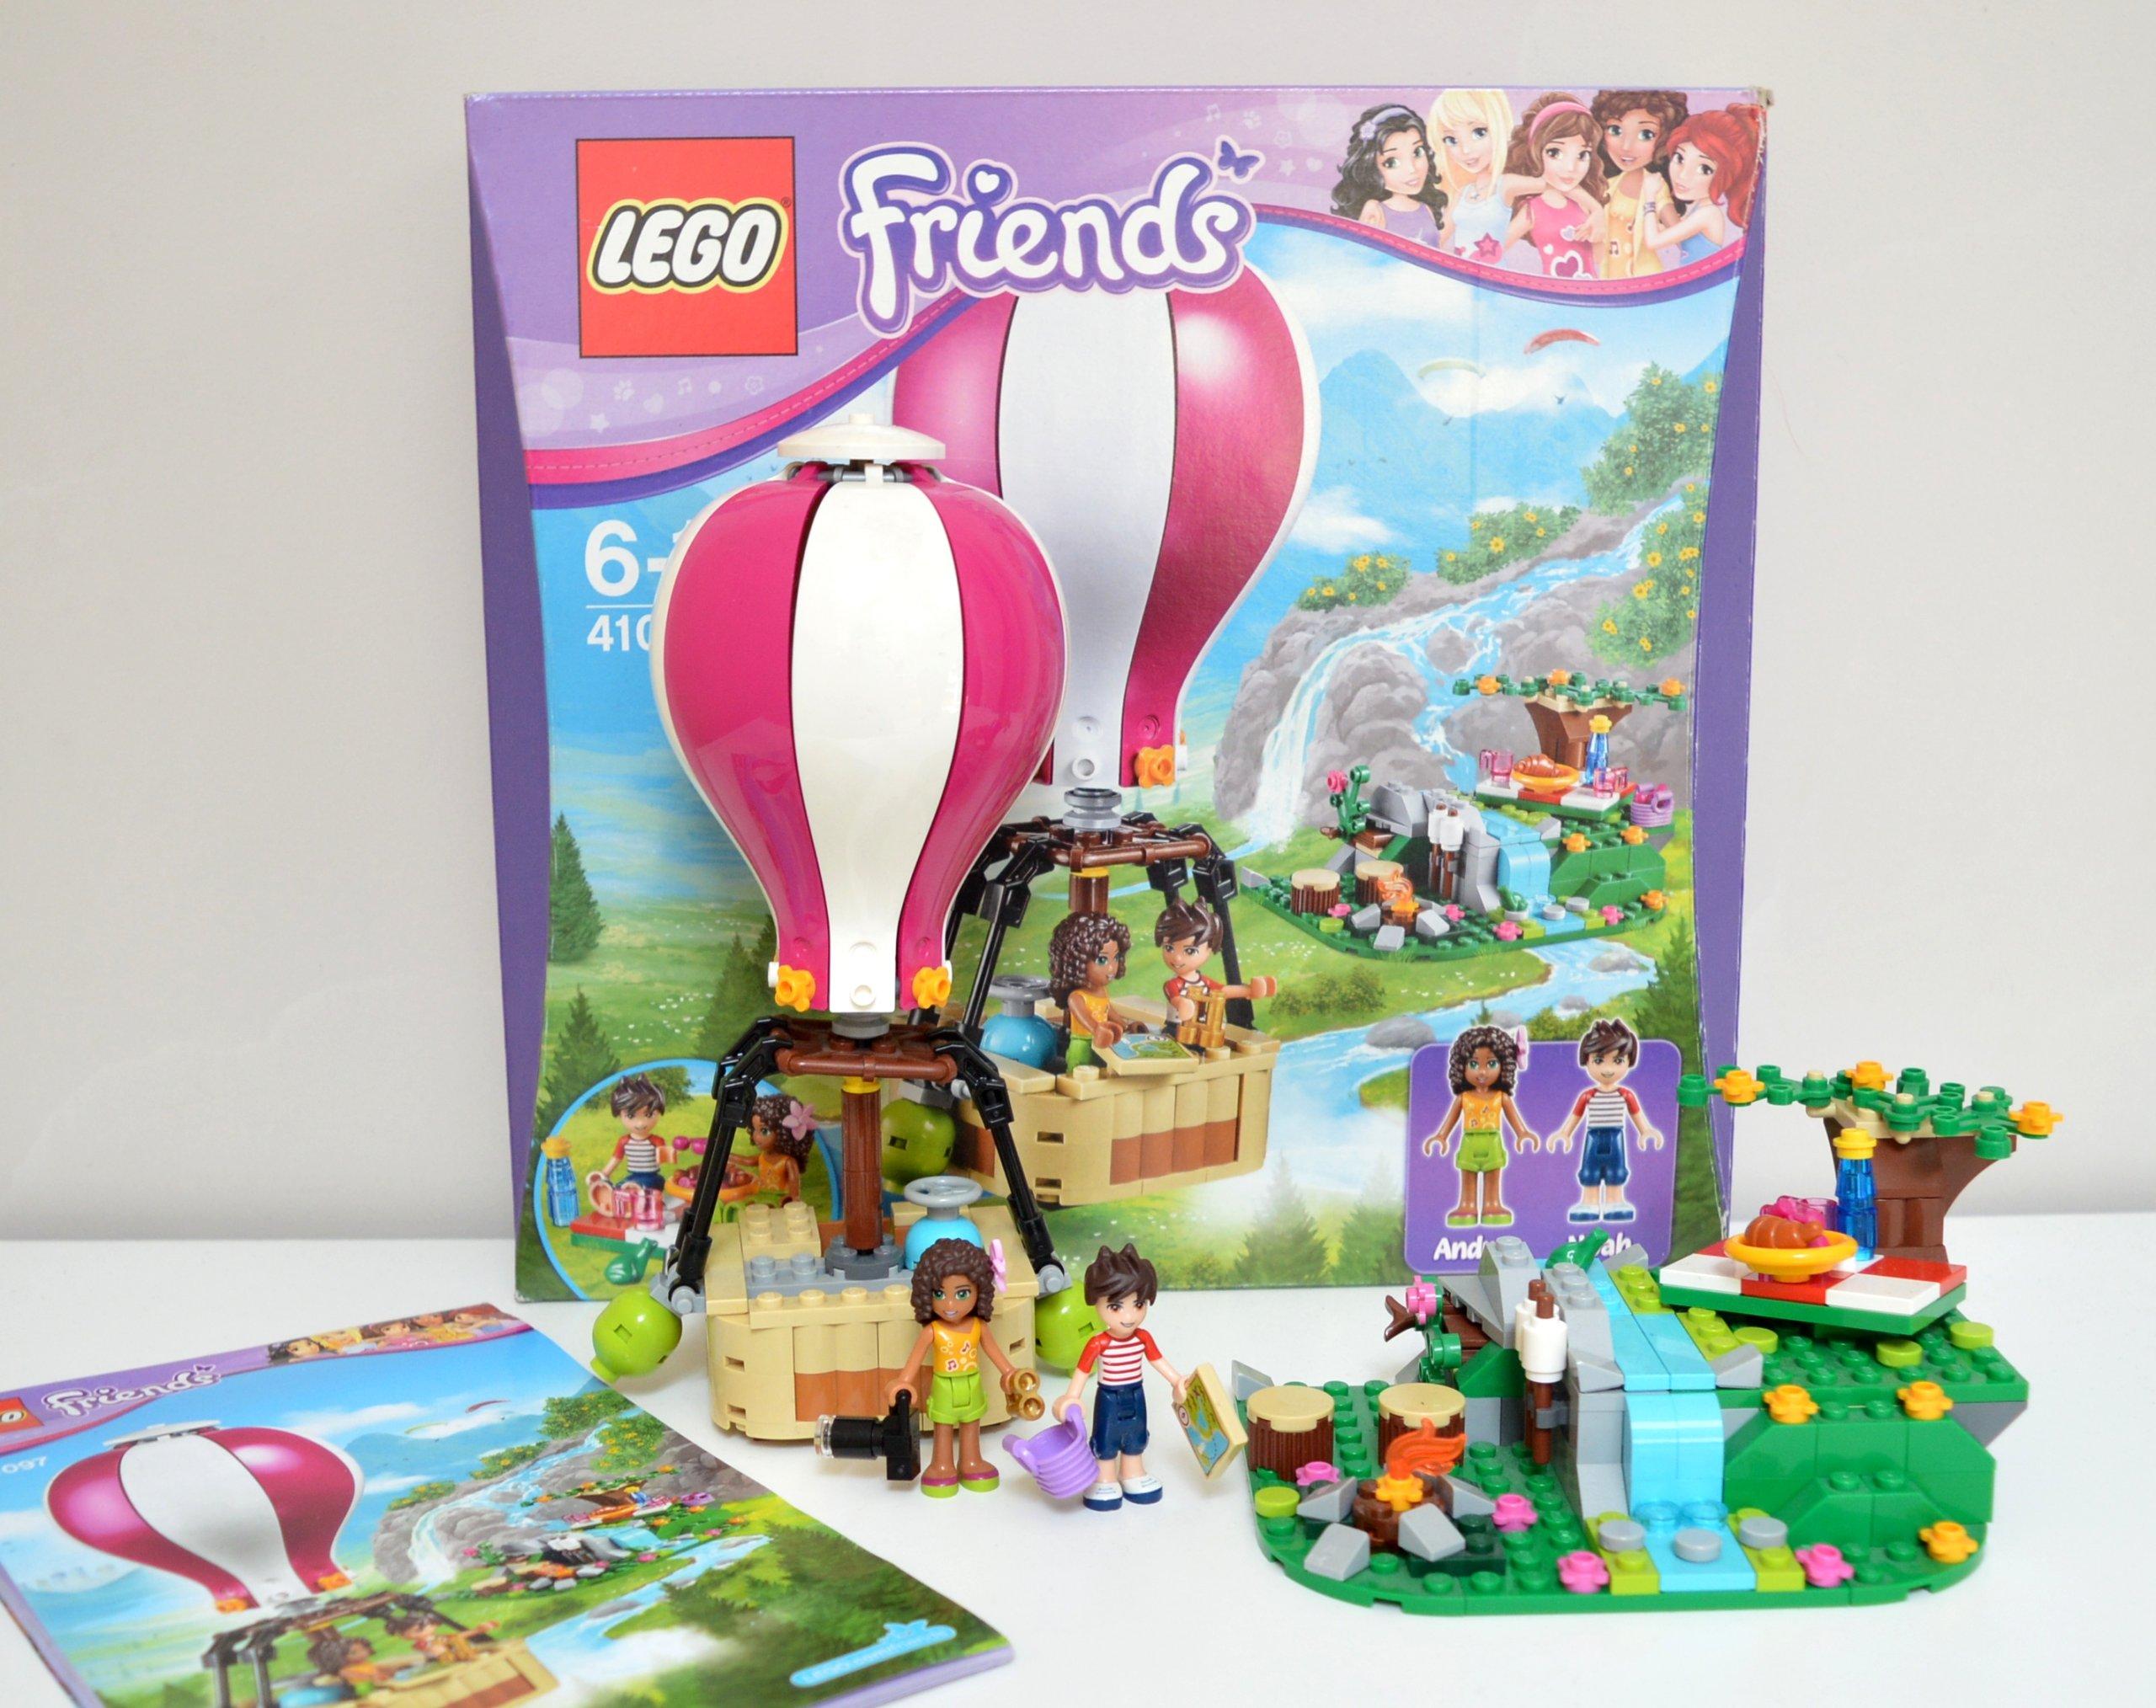 Lego Friends 41097 Balon W Heartlake Duży Zestaw 7410444547